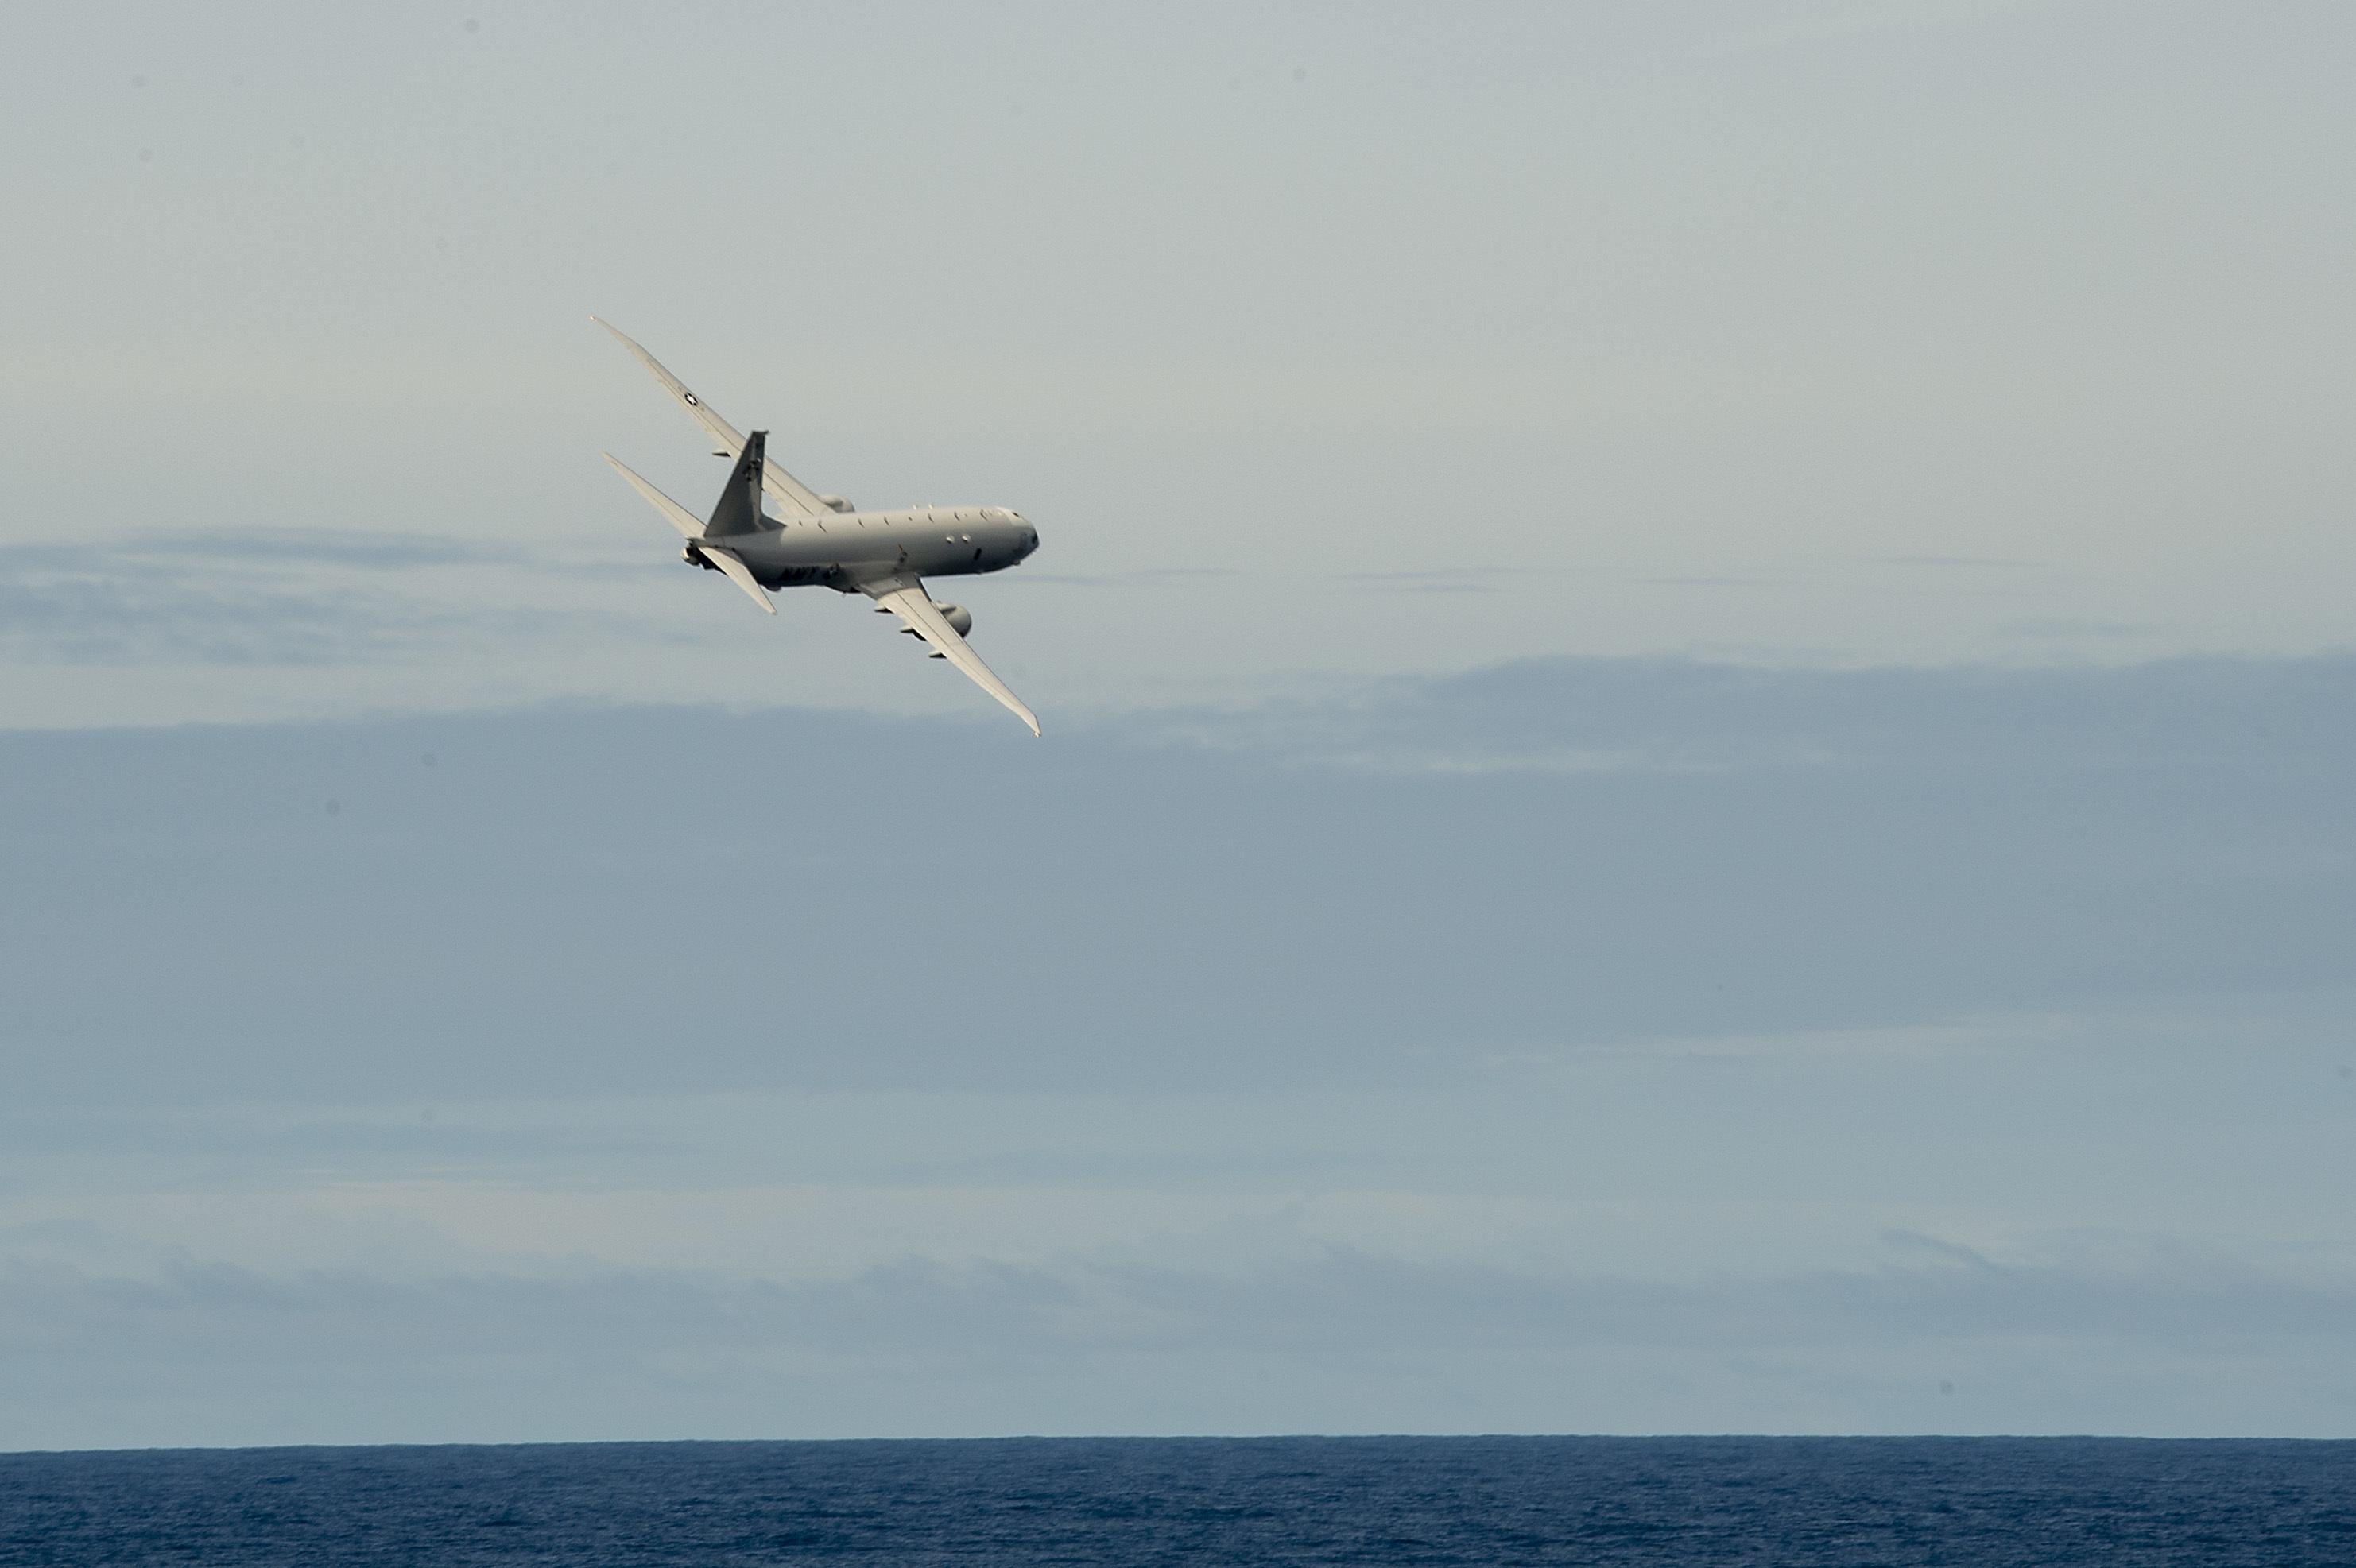 U.S. Navy P-8A Poseidon maritime patrol aircraft